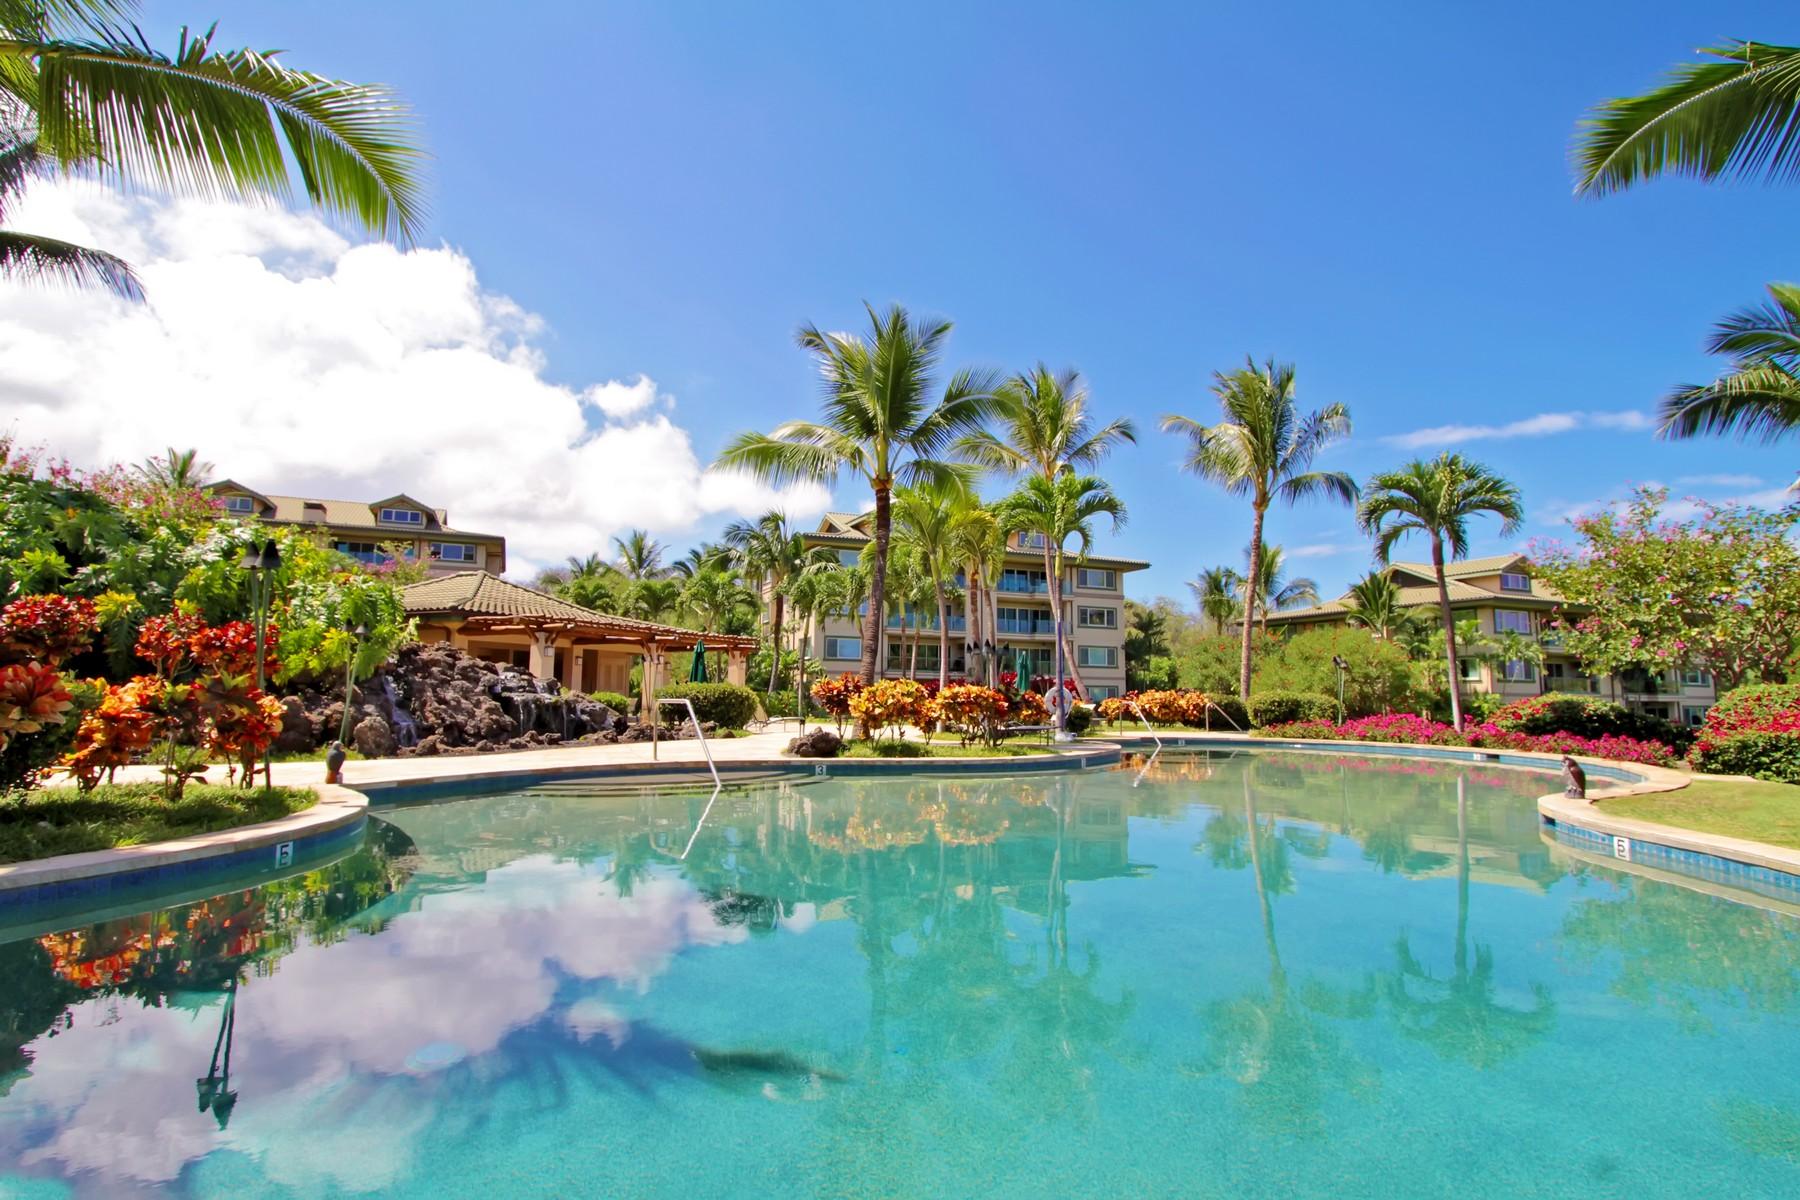 Nhà chung cư vì Bán tại Luxury Makena Maui Residential Condominium 4955 Makena Road, Na Hale O Makena D-201 Makena, Hawaii, 96753 Hoa Kỳ